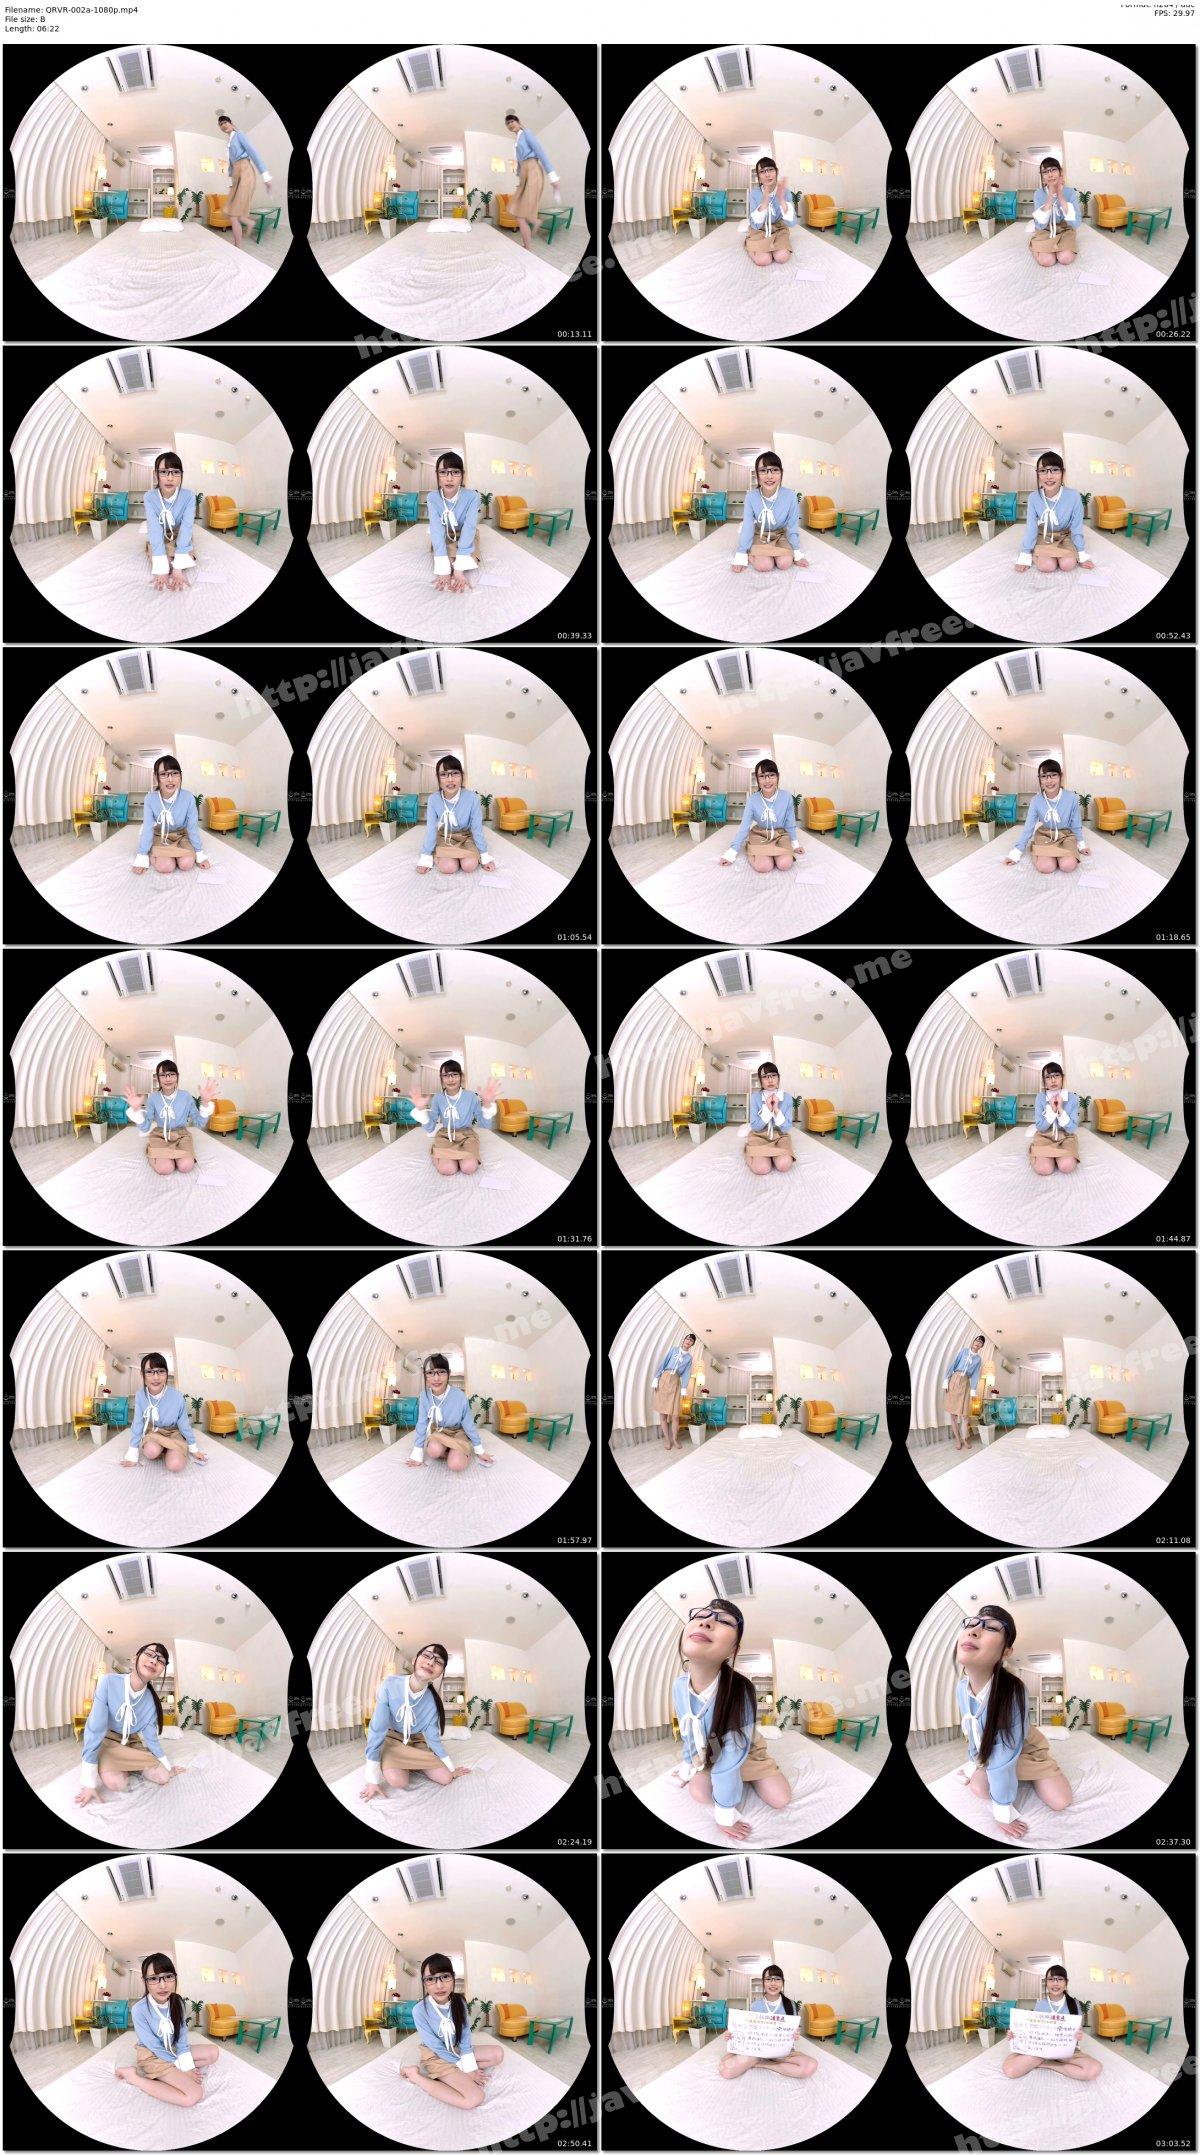 [HD][QRVR-002] 【VR】3DVR 新少子化対策法可決!初対面でいきなり恋に落ち即子作り!街の図書館で働く眼鏡地味子で恥ずかしがり屋のしゅりちゃんと恥じらい初SEX 跡美しゅり - image QRVR-002a-1080p on https://javfree.me